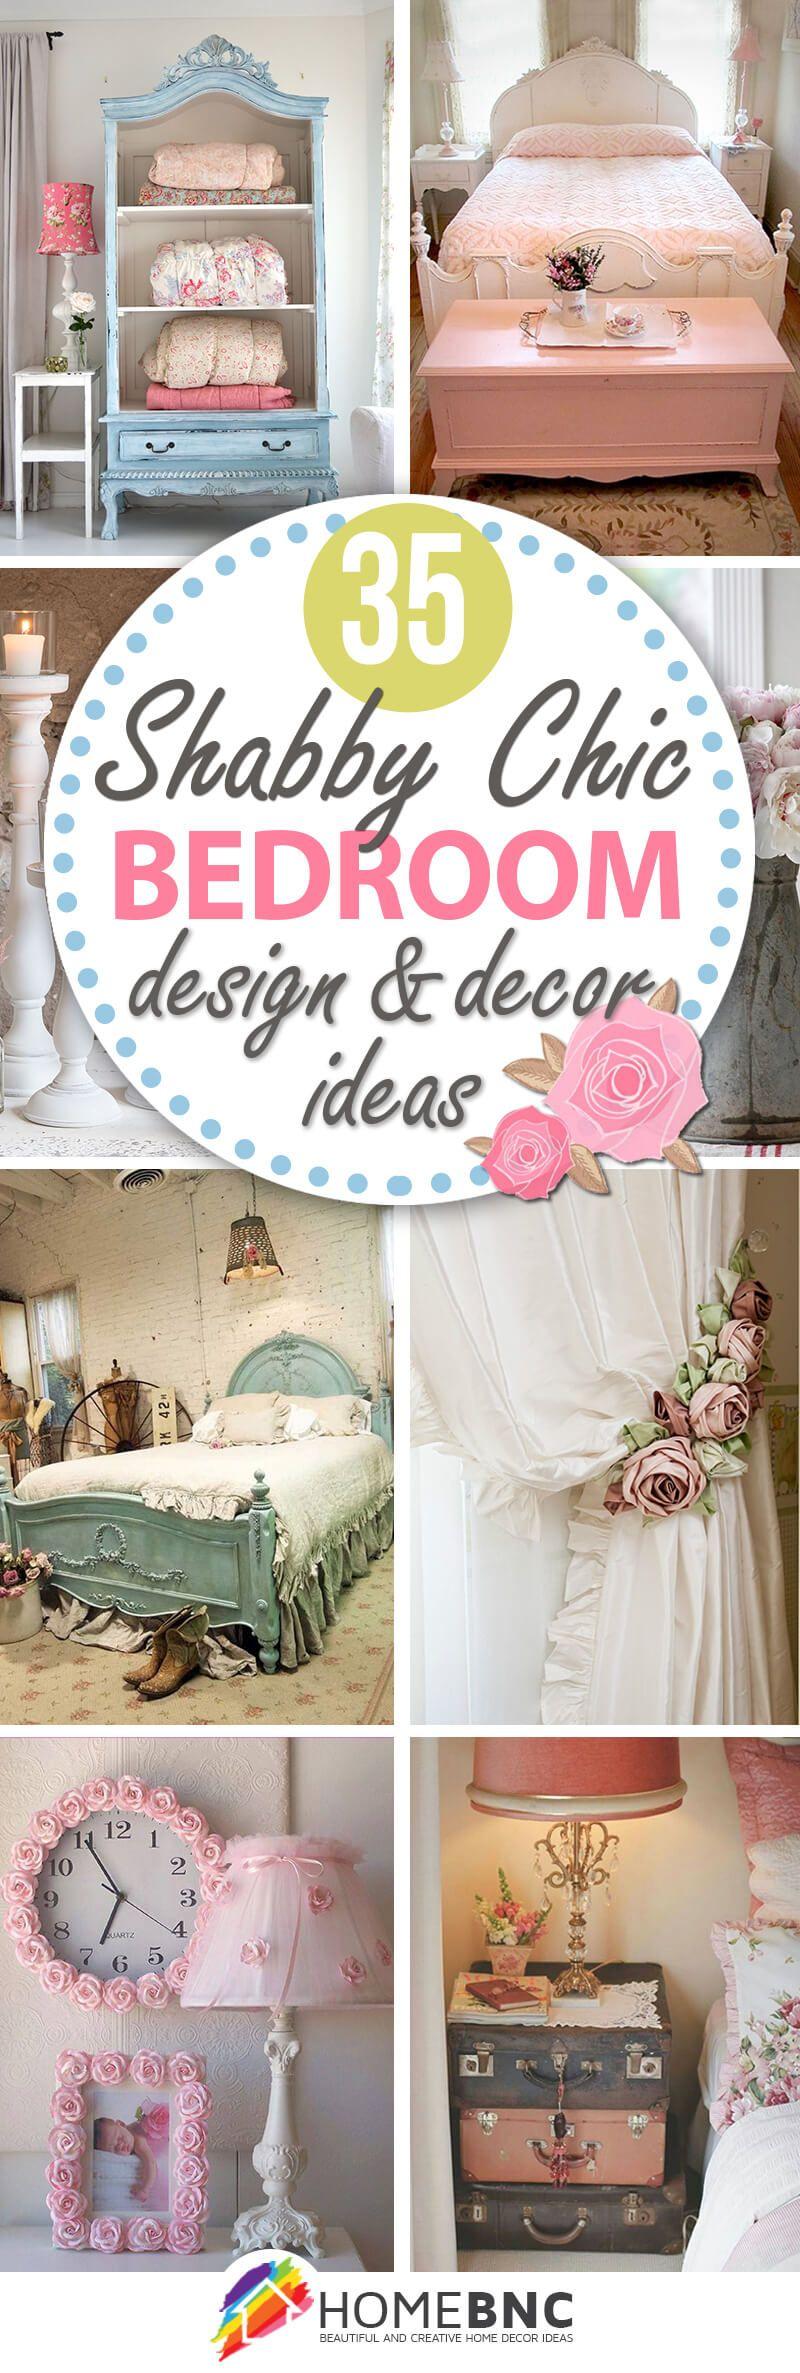 Bedroom Design Ideas Shabby Chic 35 amazingly pretty shabby chic bedroom design and decor ideas